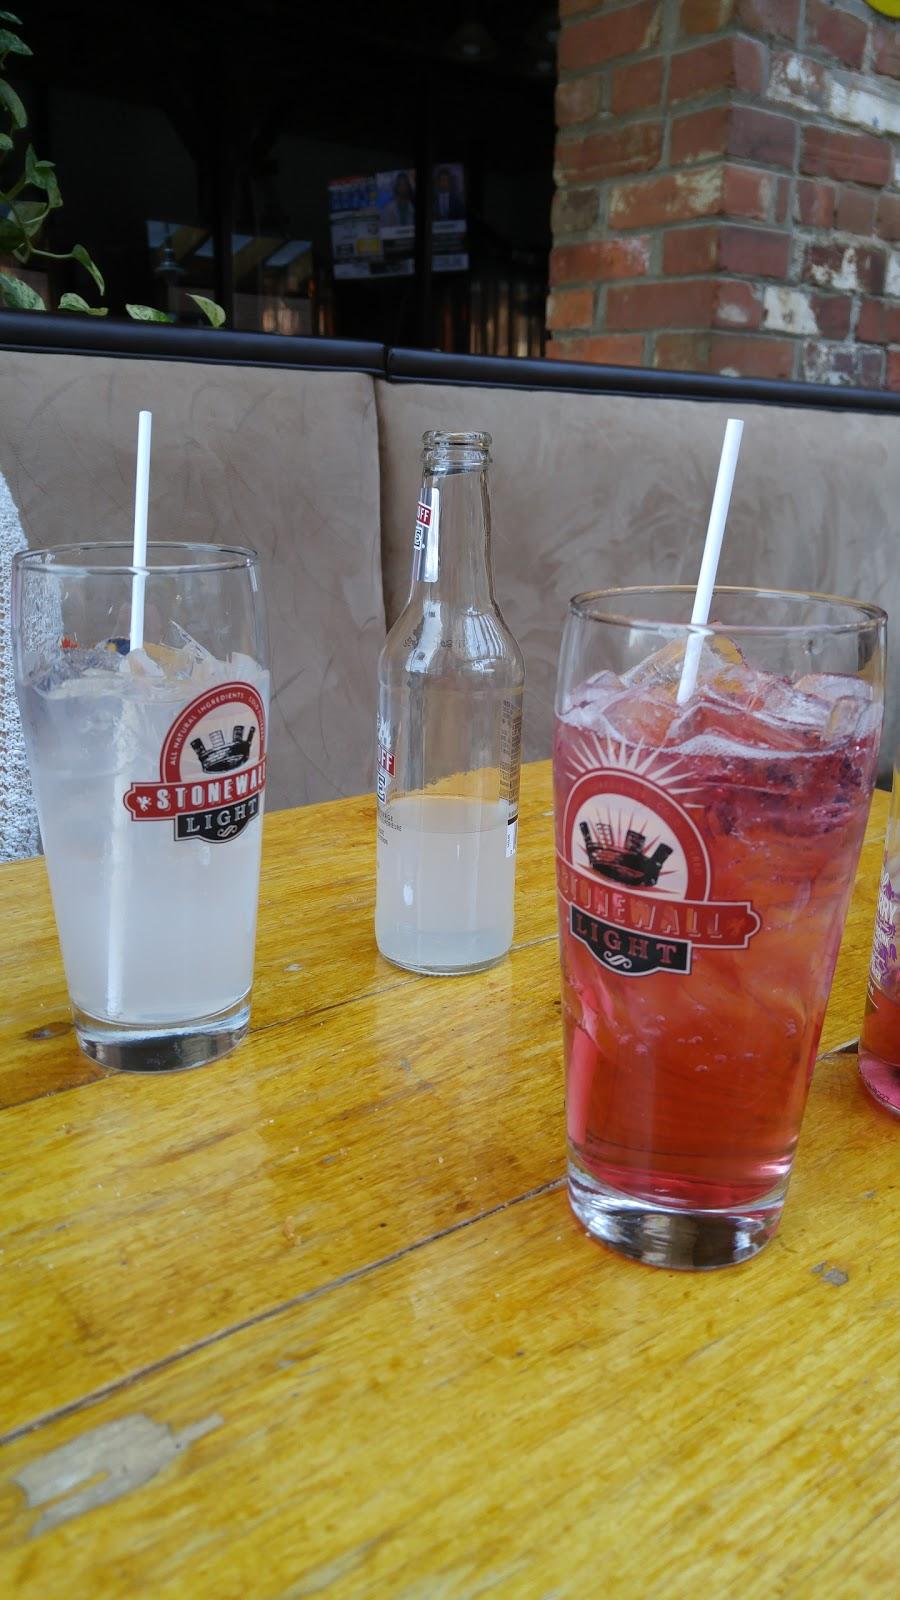 Tracks Brew Pub | restaurant | 60 Queen St E, Brampton, ON L6V 1A9, Canada | 9054533063 OR +1 905-453-3063